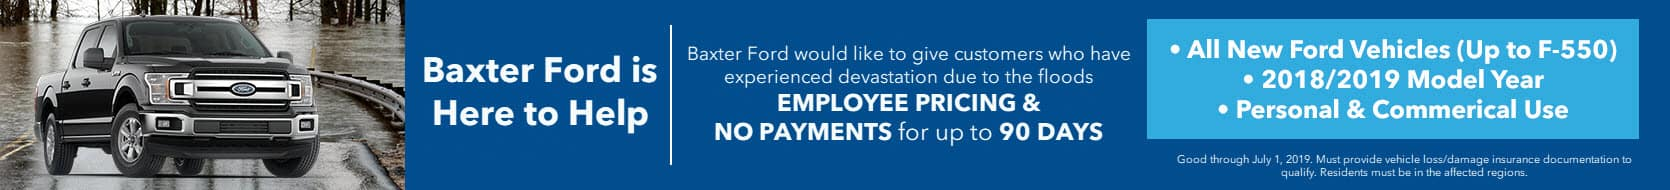 Baxter Ford Flood Relief Offer